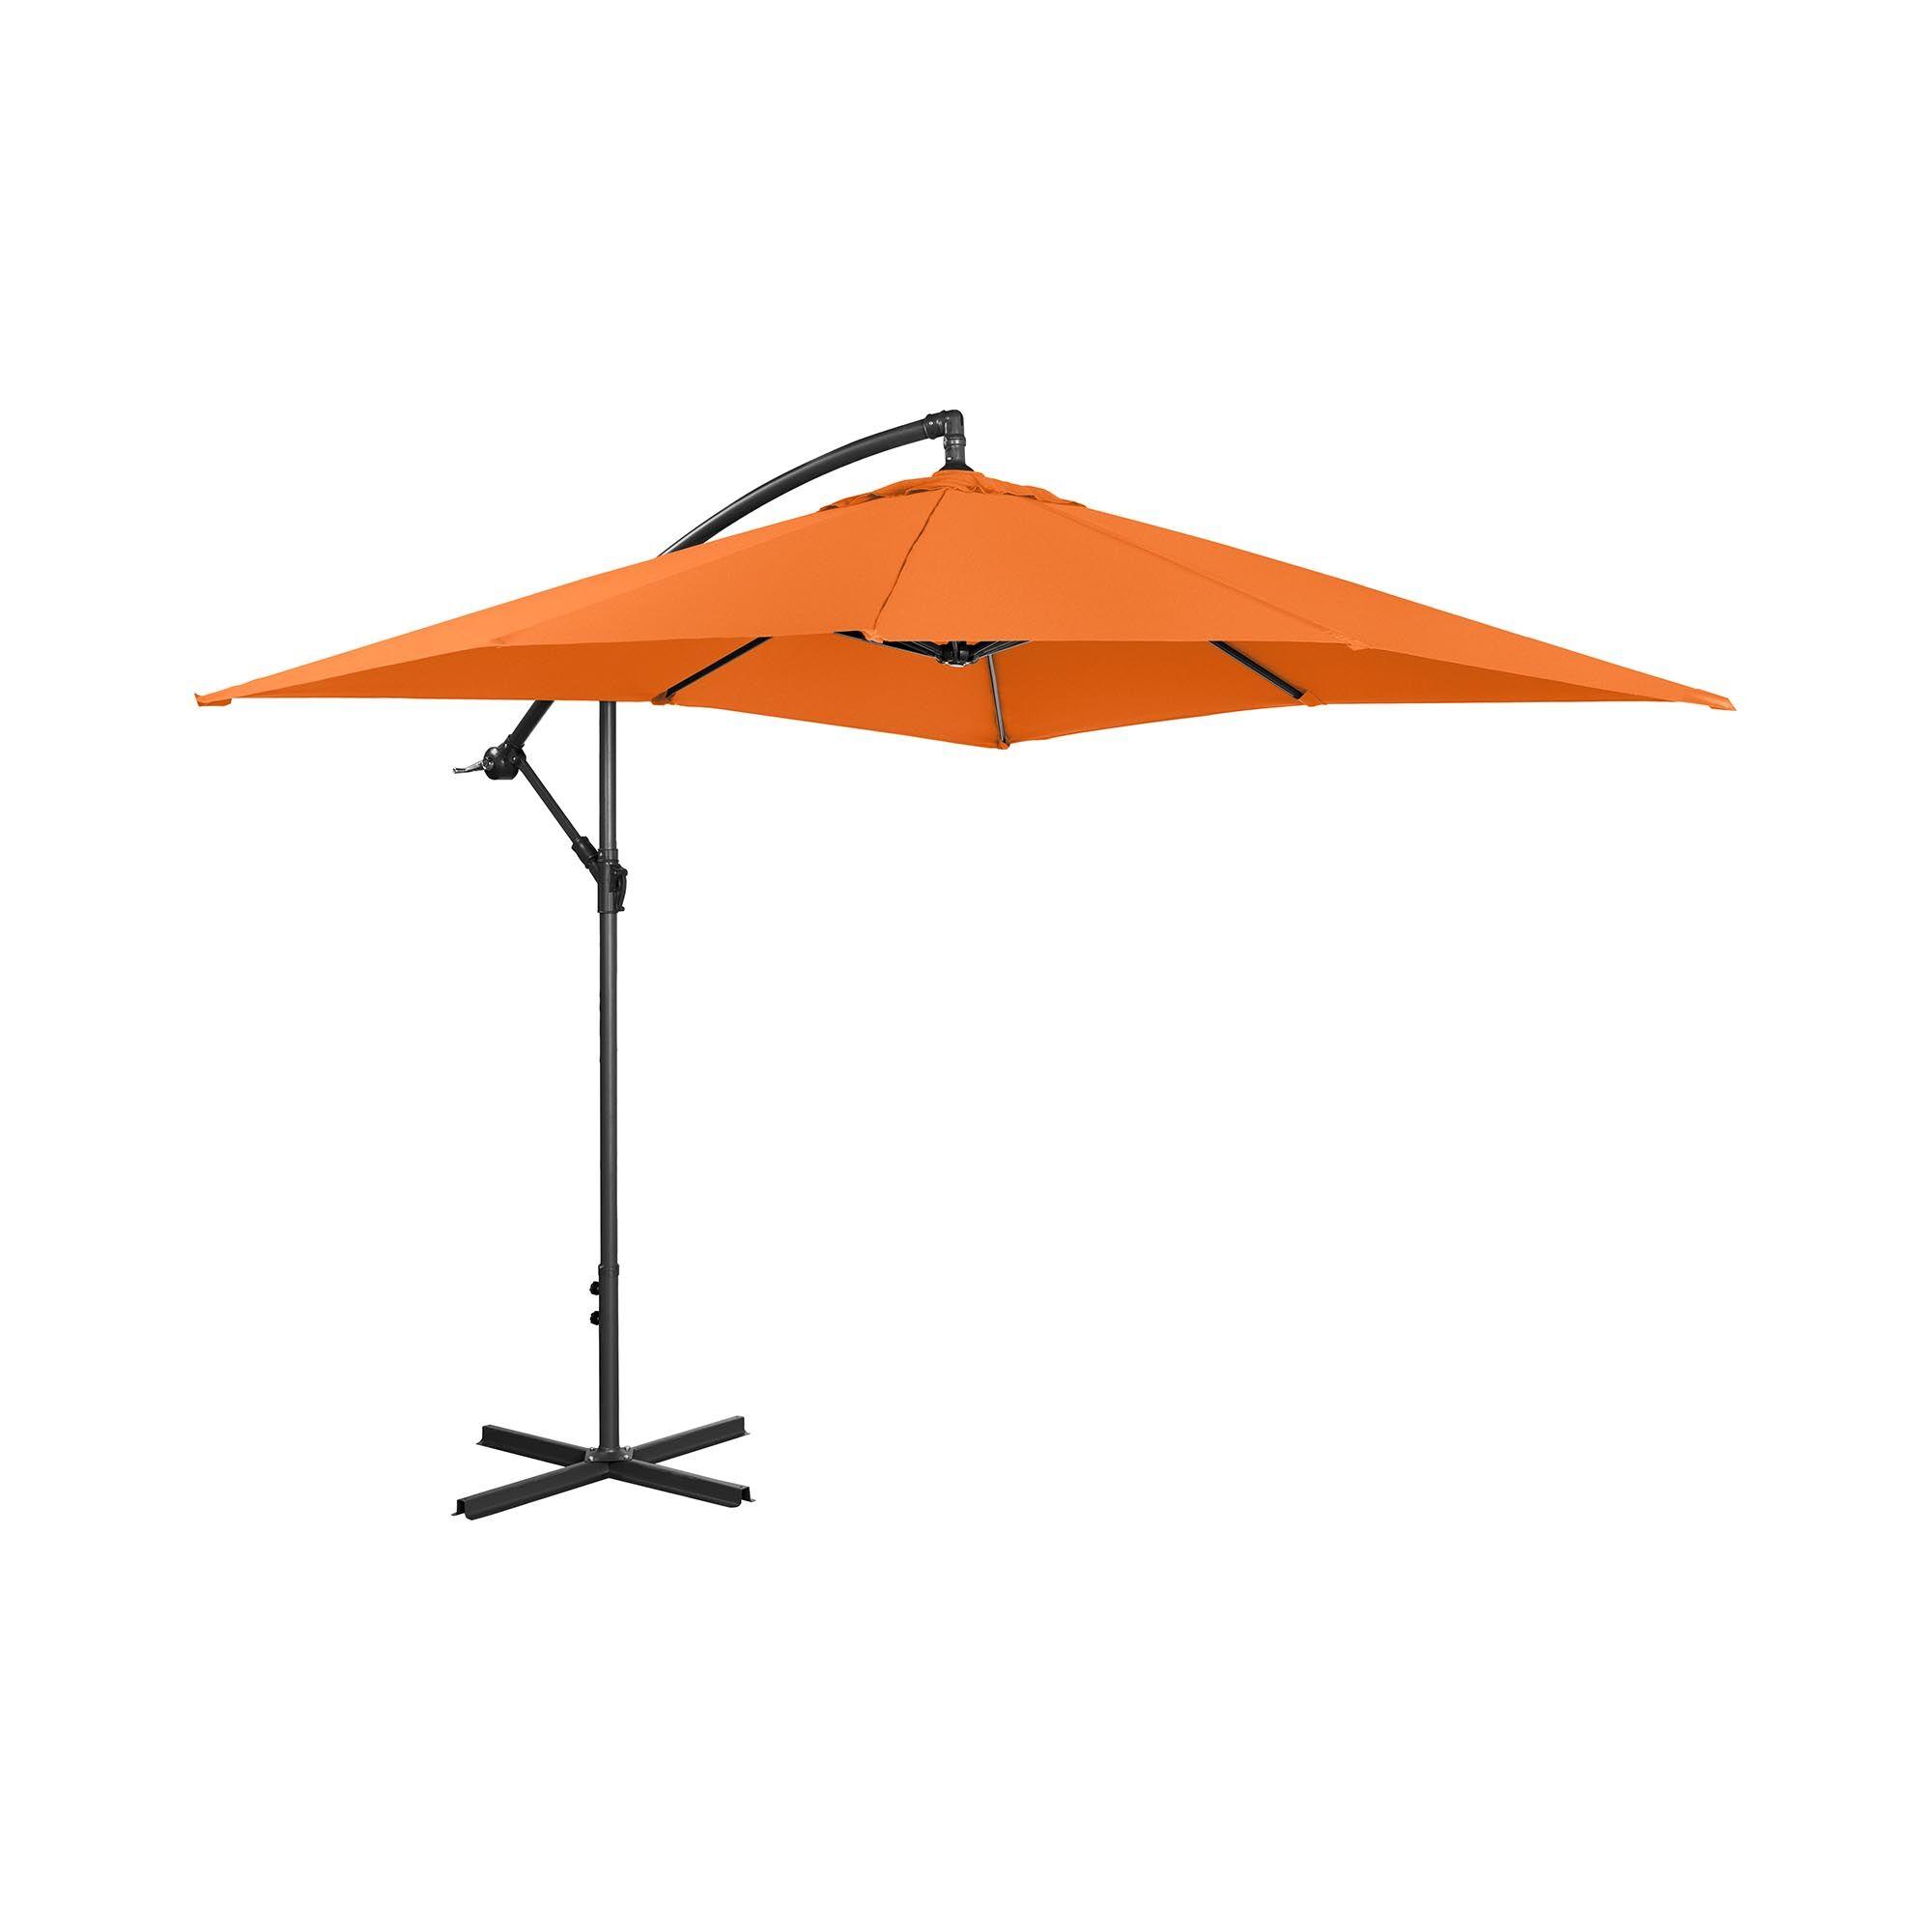 Uniprodo Hanging Parasol - orange - square - 250 x 250 cm - tiltable